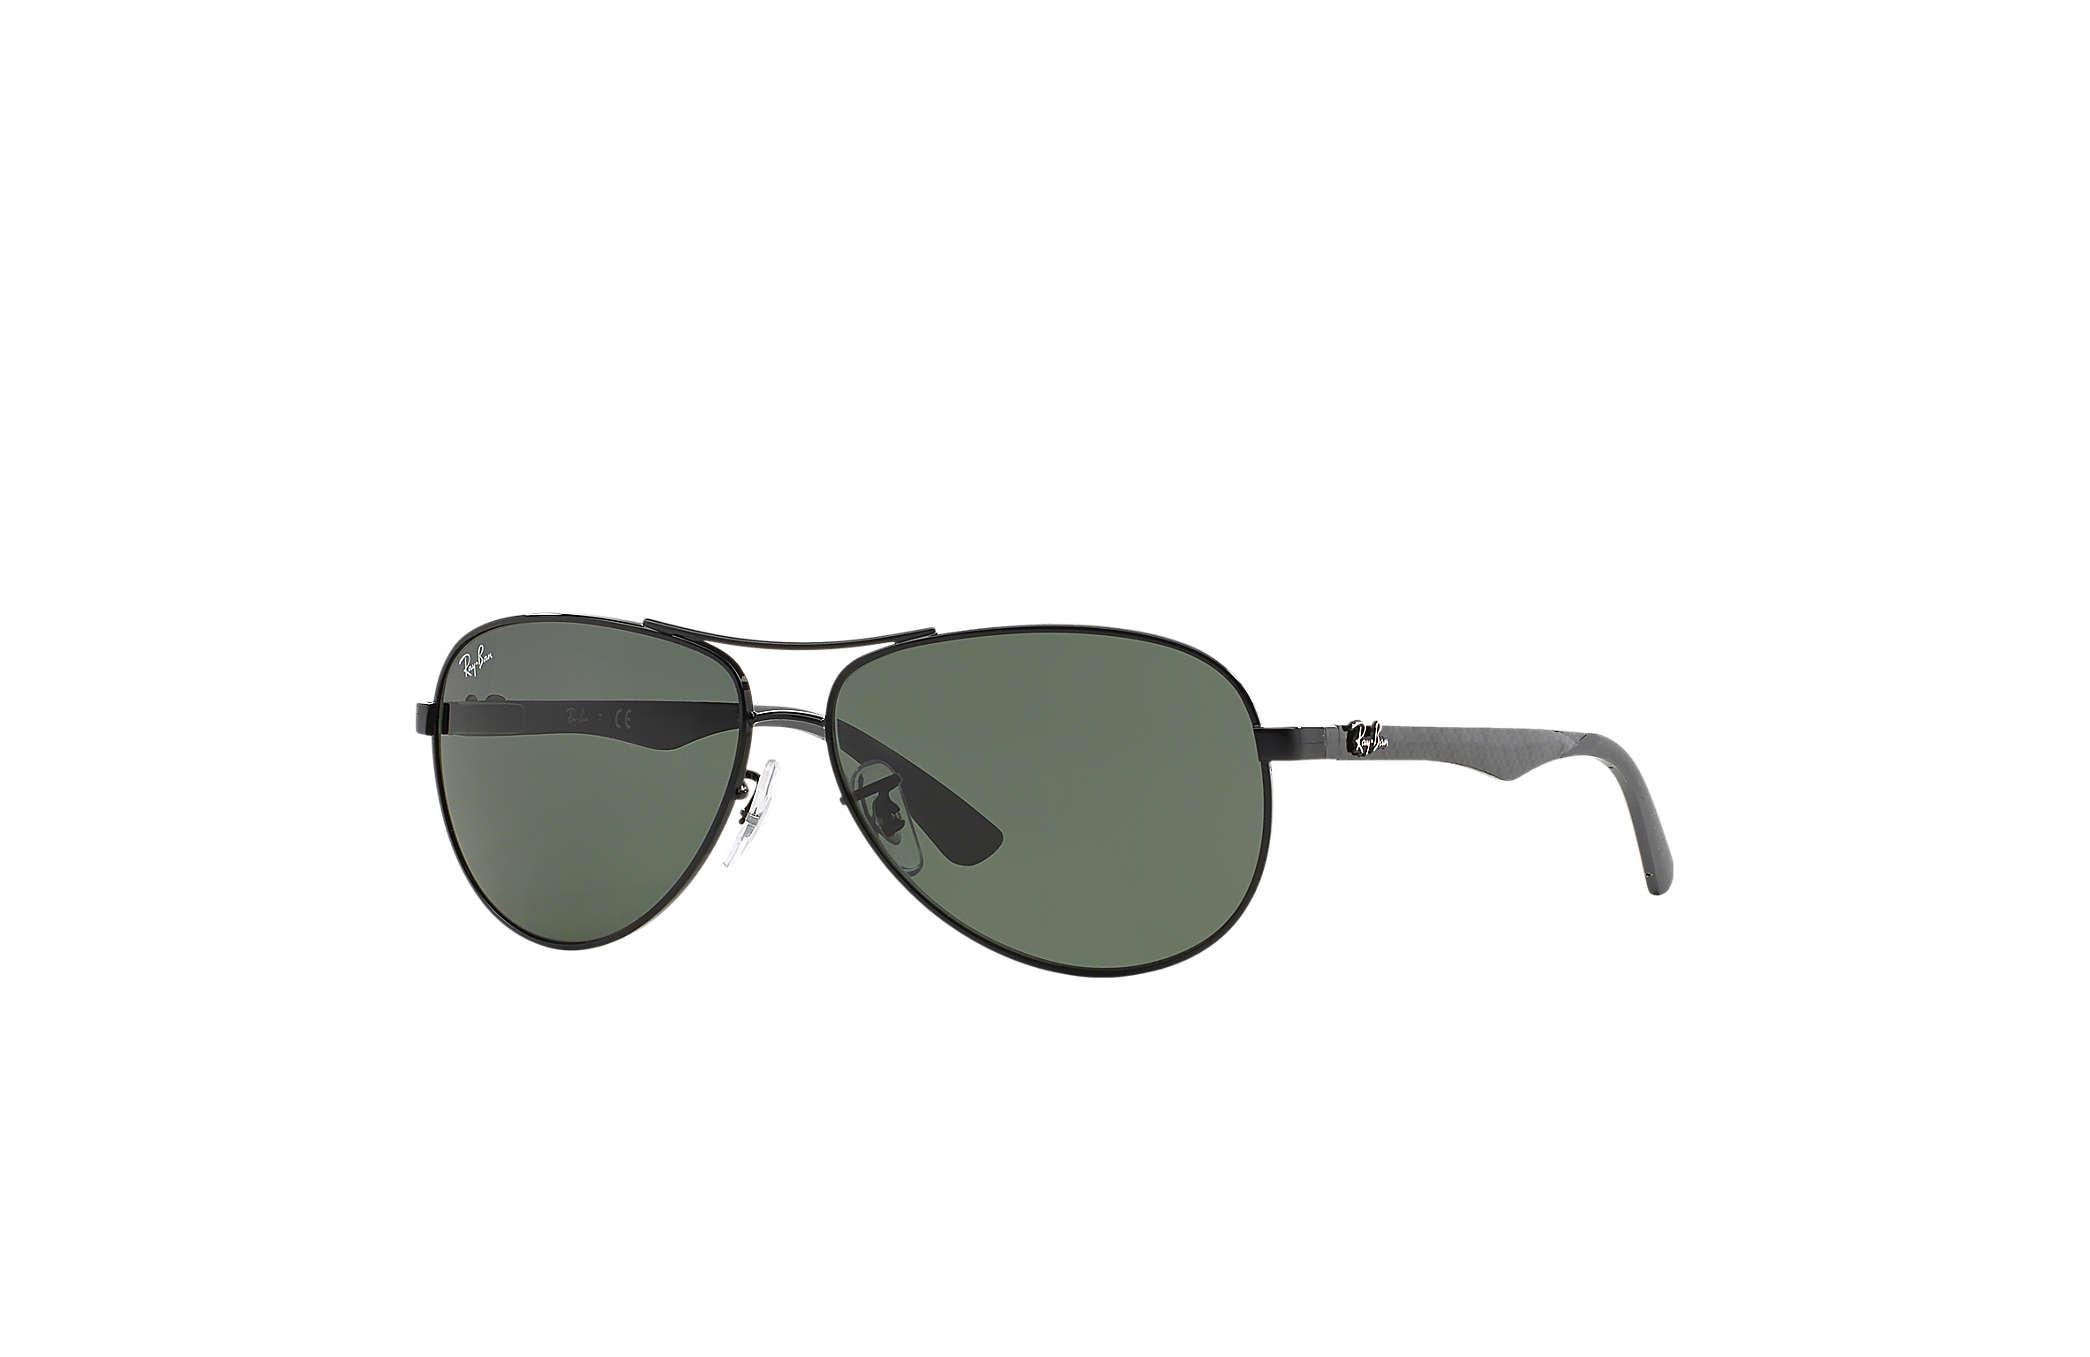 costco sunglasses ray ban on sale. Black Bedroom Furniture Sets. Home Design Ideas